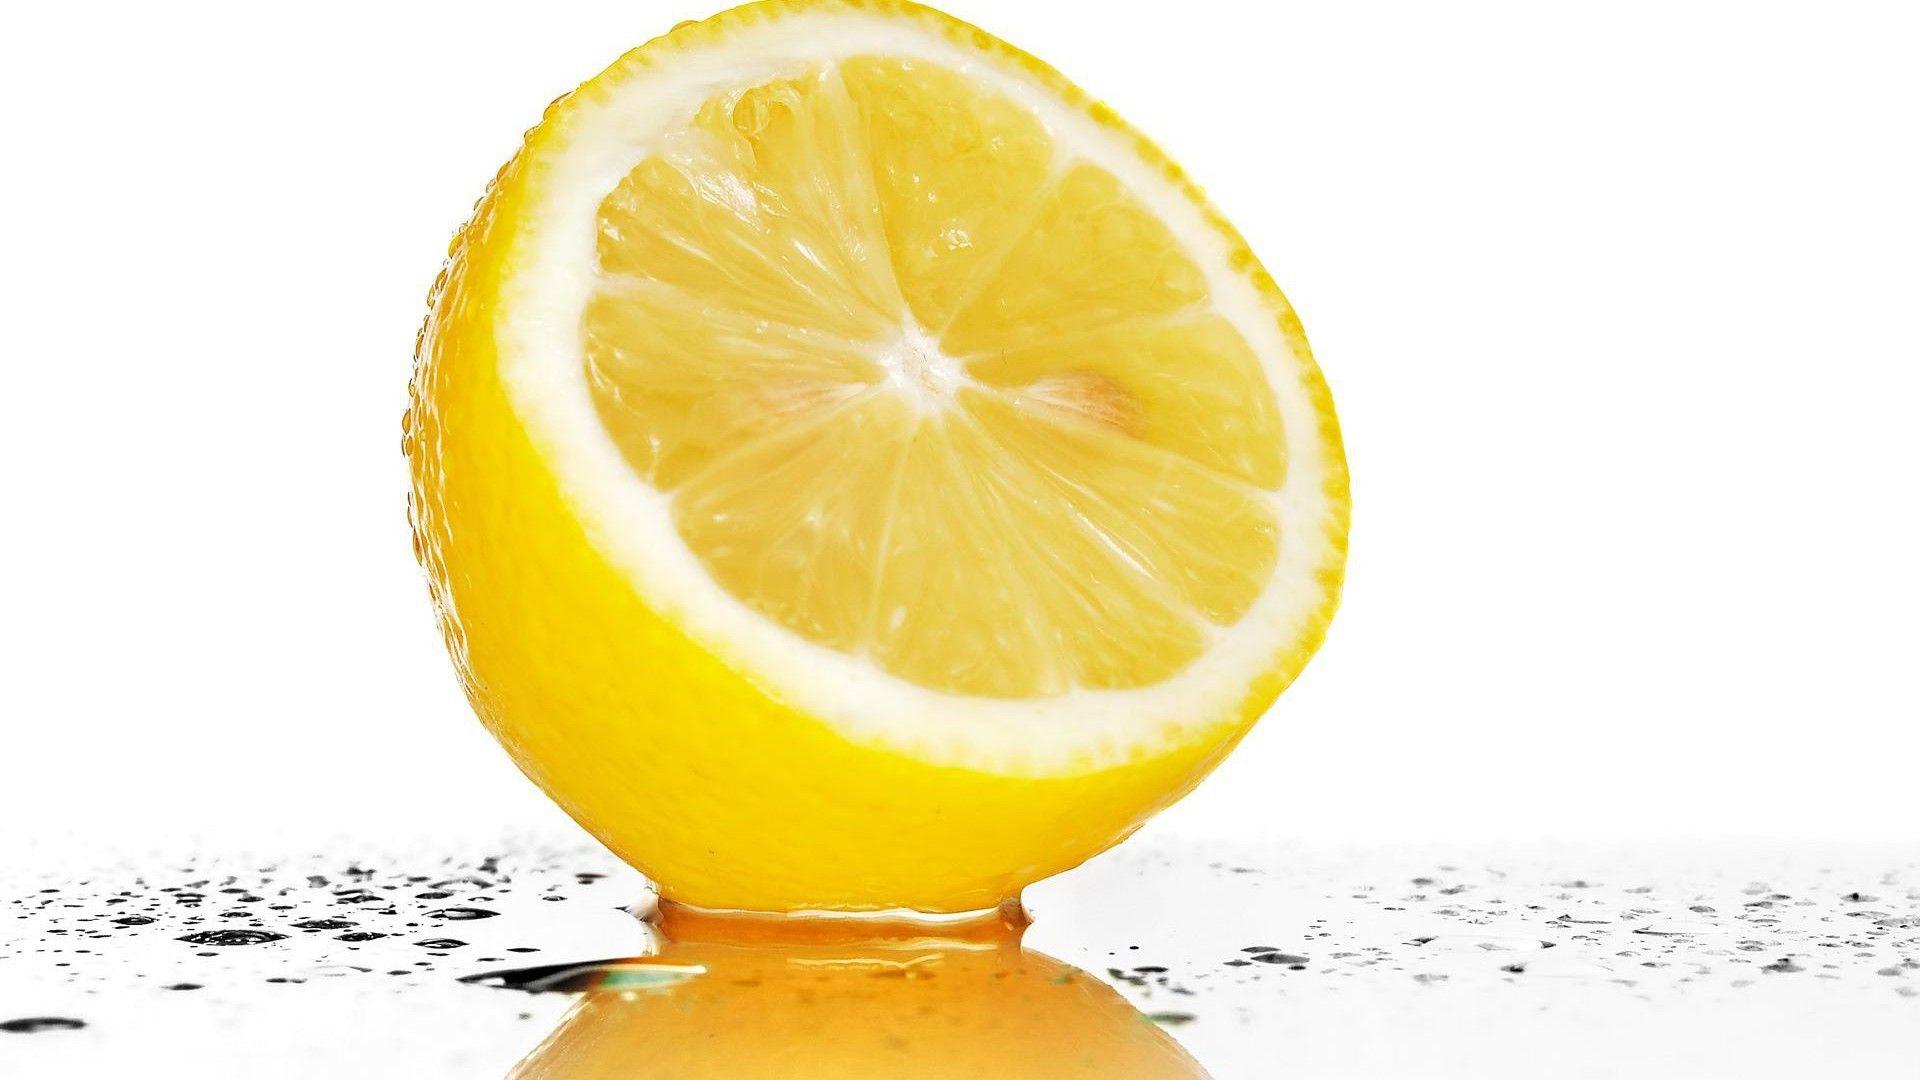 Lemon The Vase Wallpaper 1920×1080 Lemon Wallpaper (27 Wallpapers) | Adorable Wallpapers